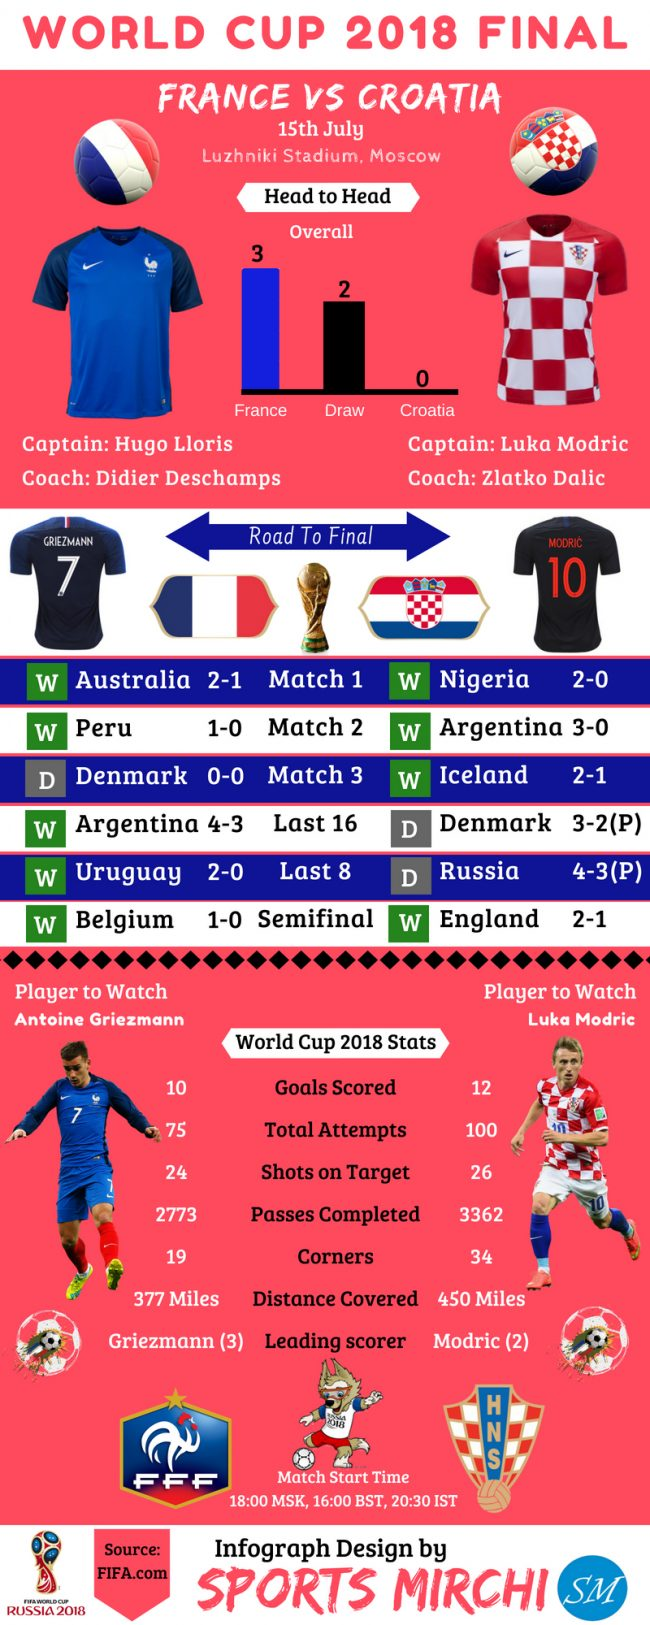 FIFA World Cup 2018 Final: France vs Croatia [Infographic]